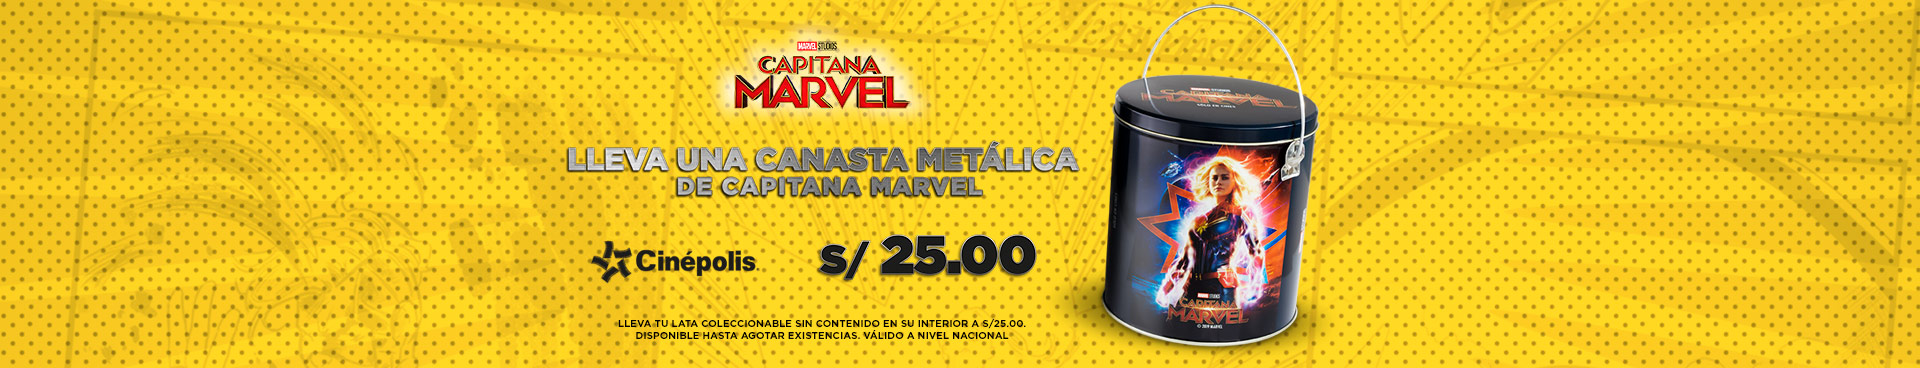 Promo Capitana Marvel